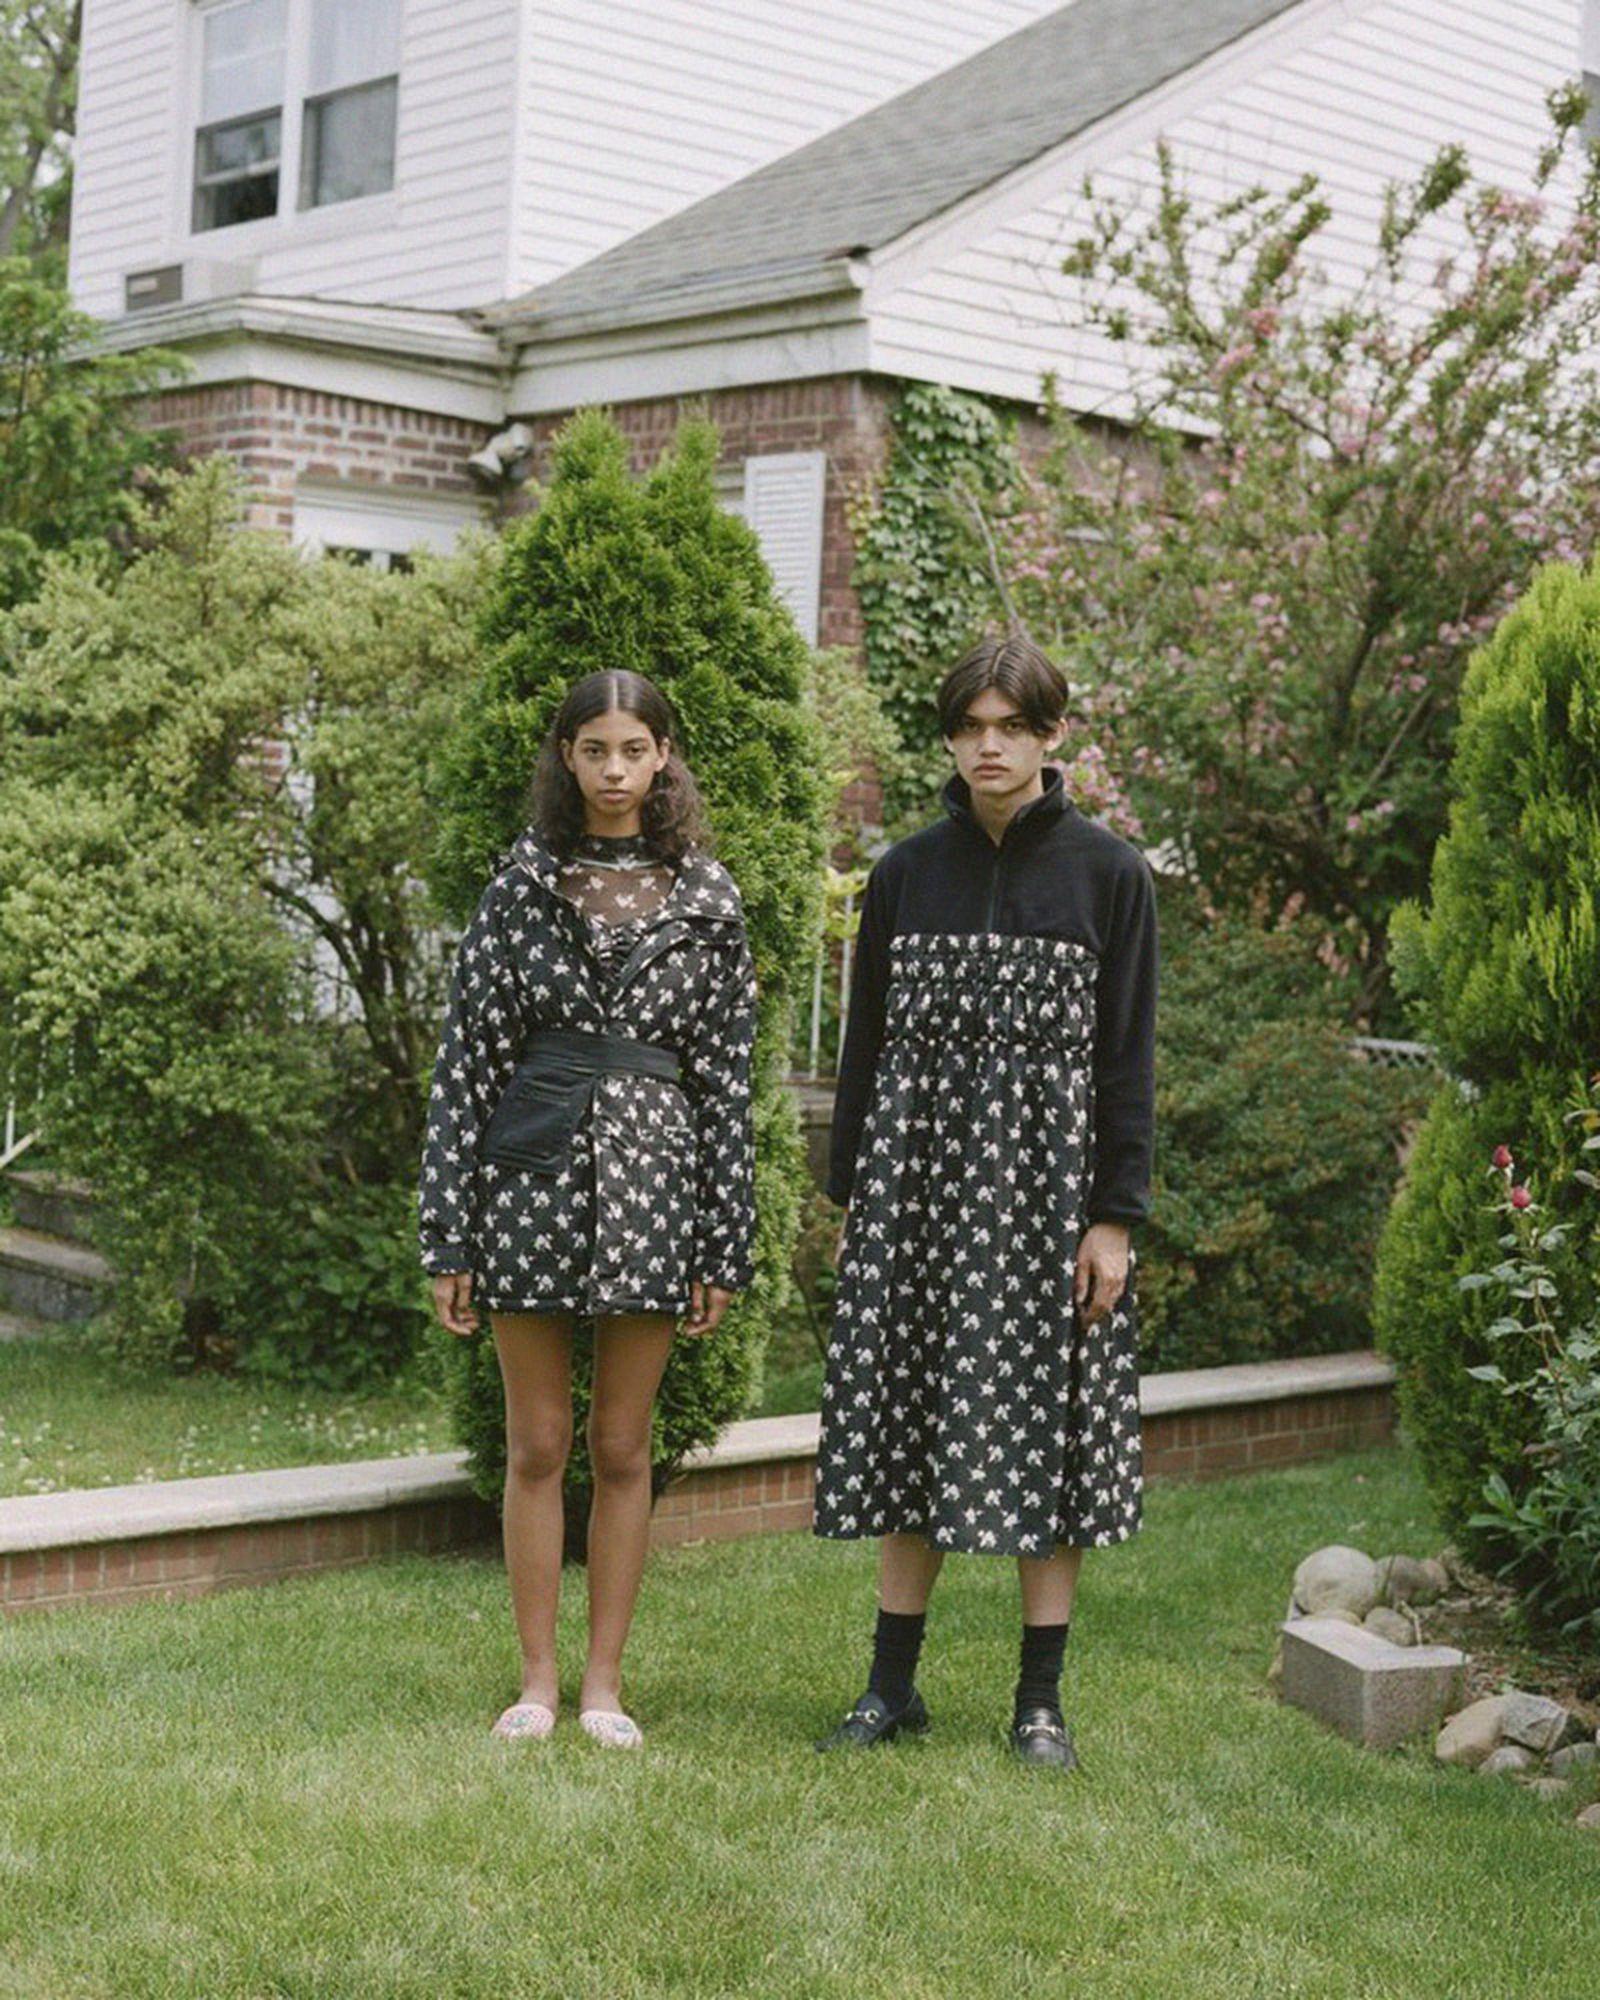 genderless fashion consumers Eckhaus Latta Vaquera gender fluidity